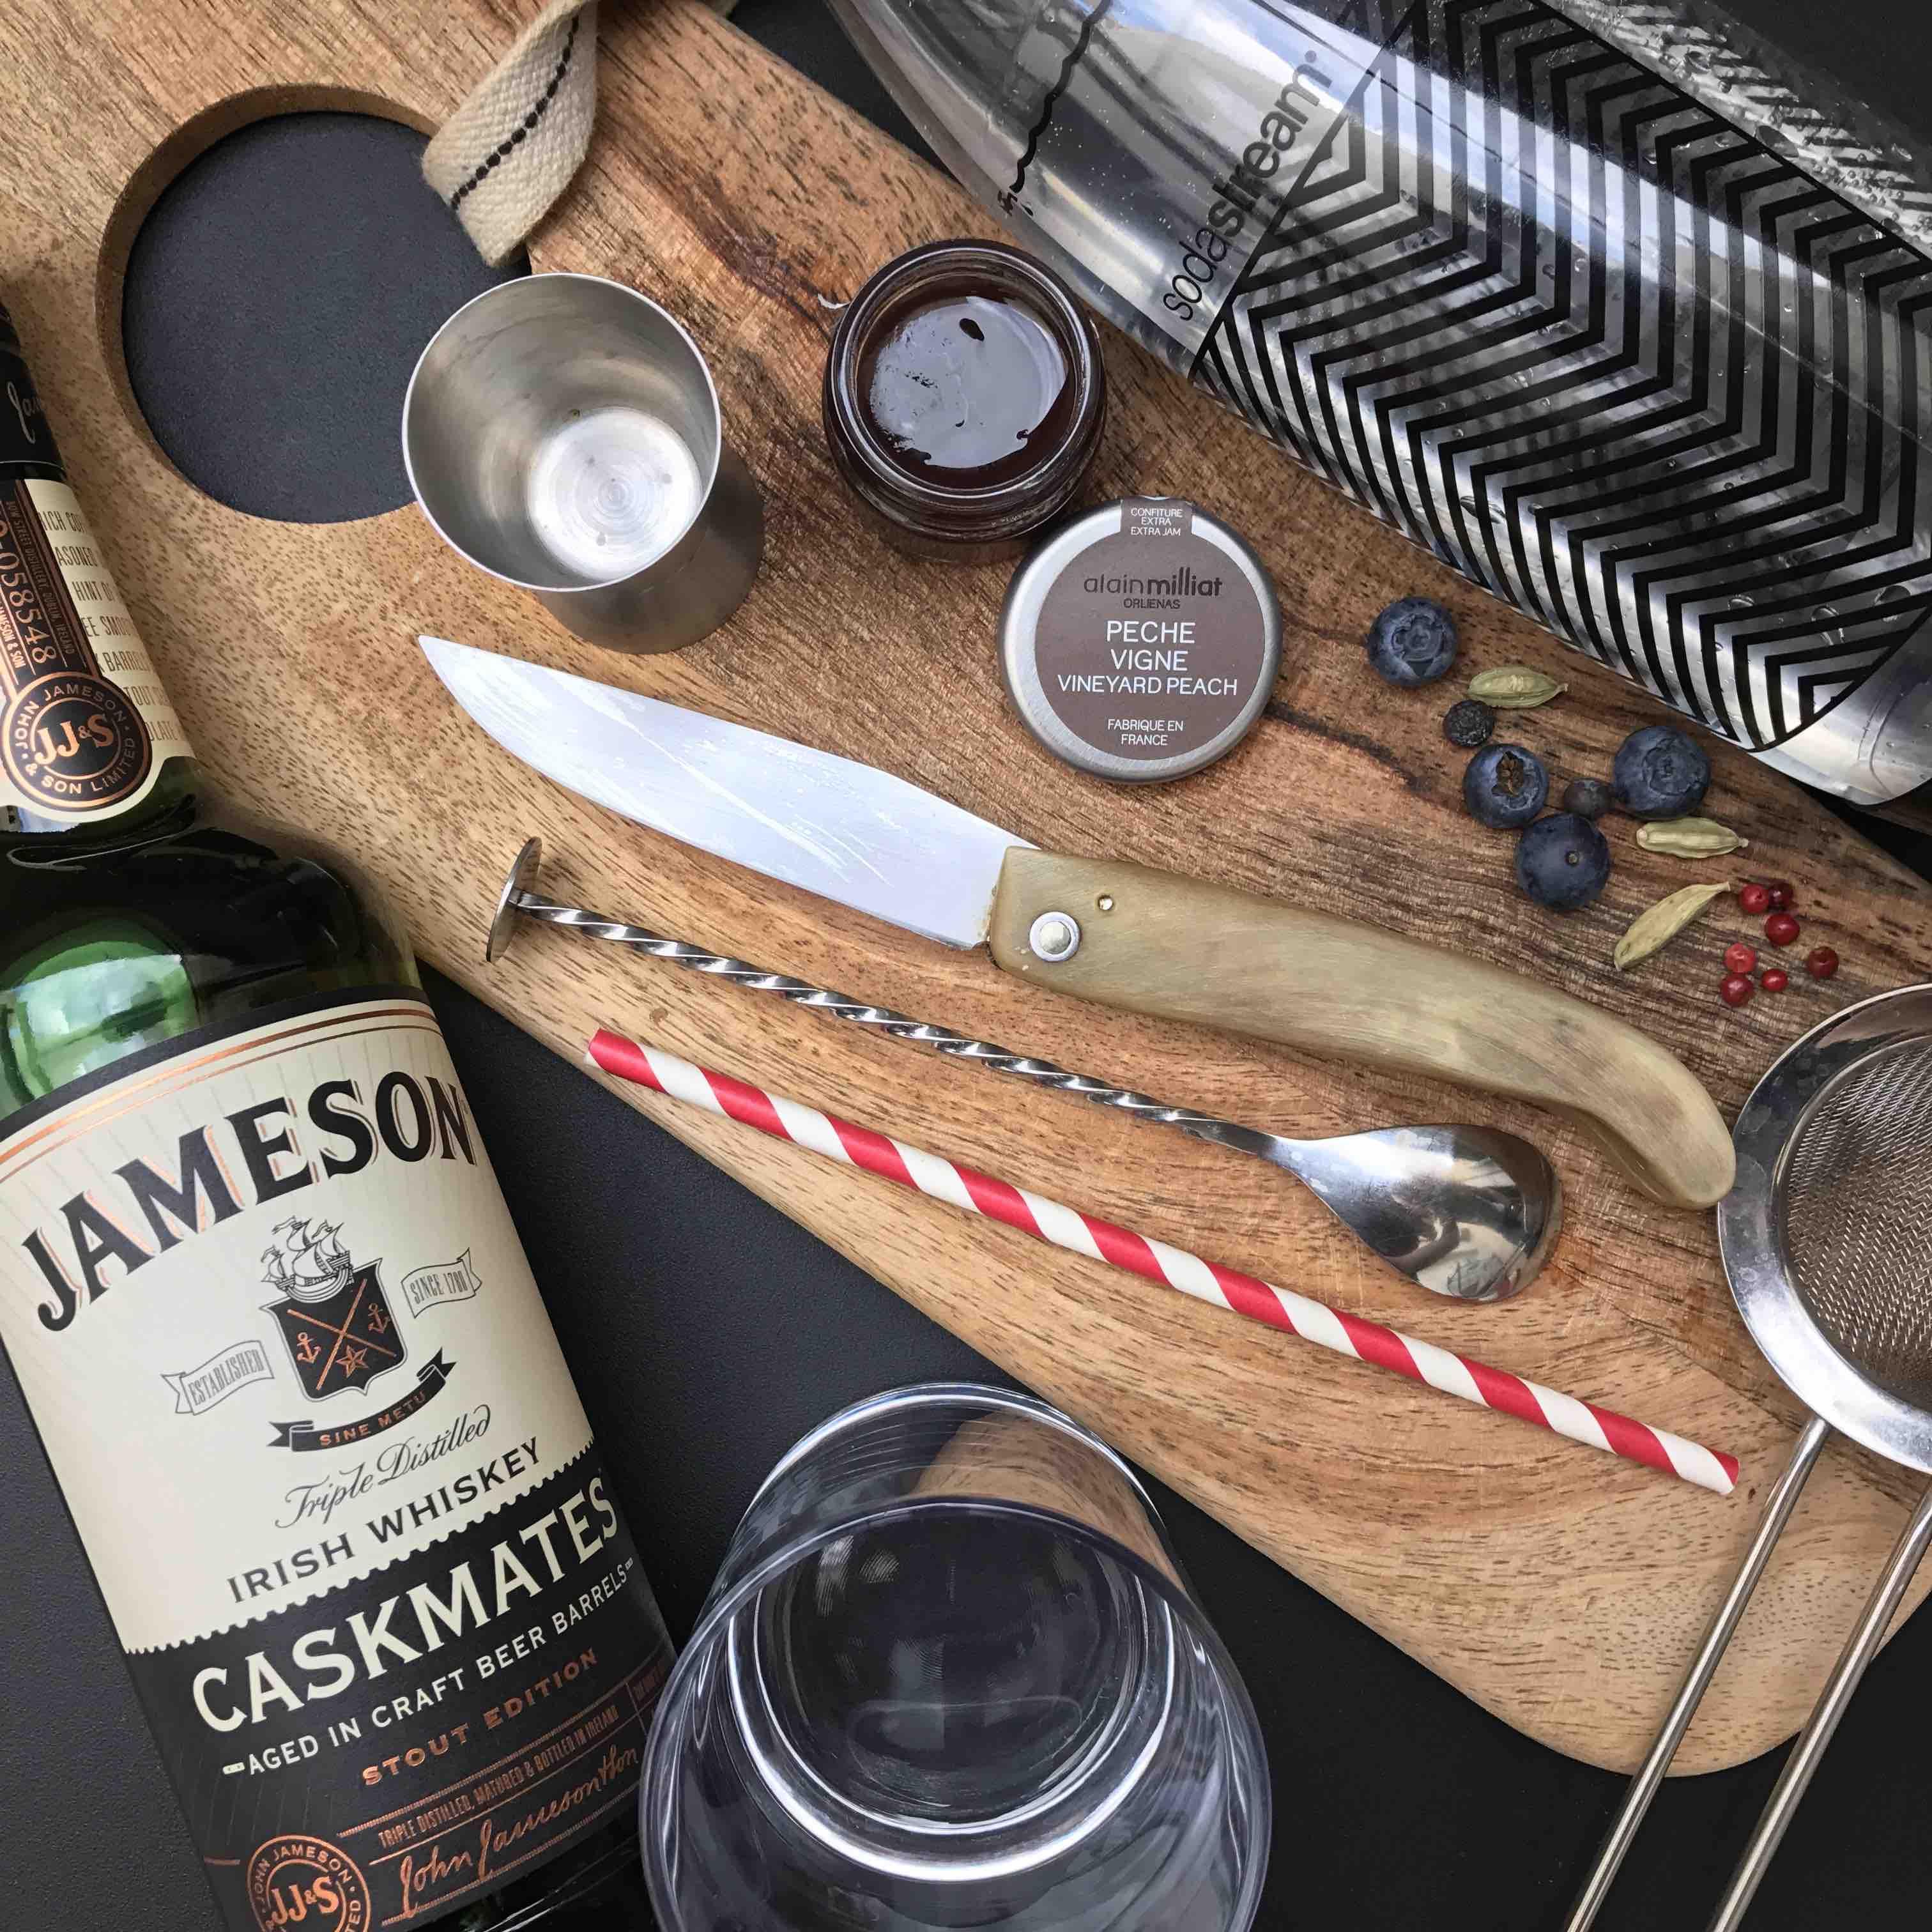 cocktail jameson caskmate